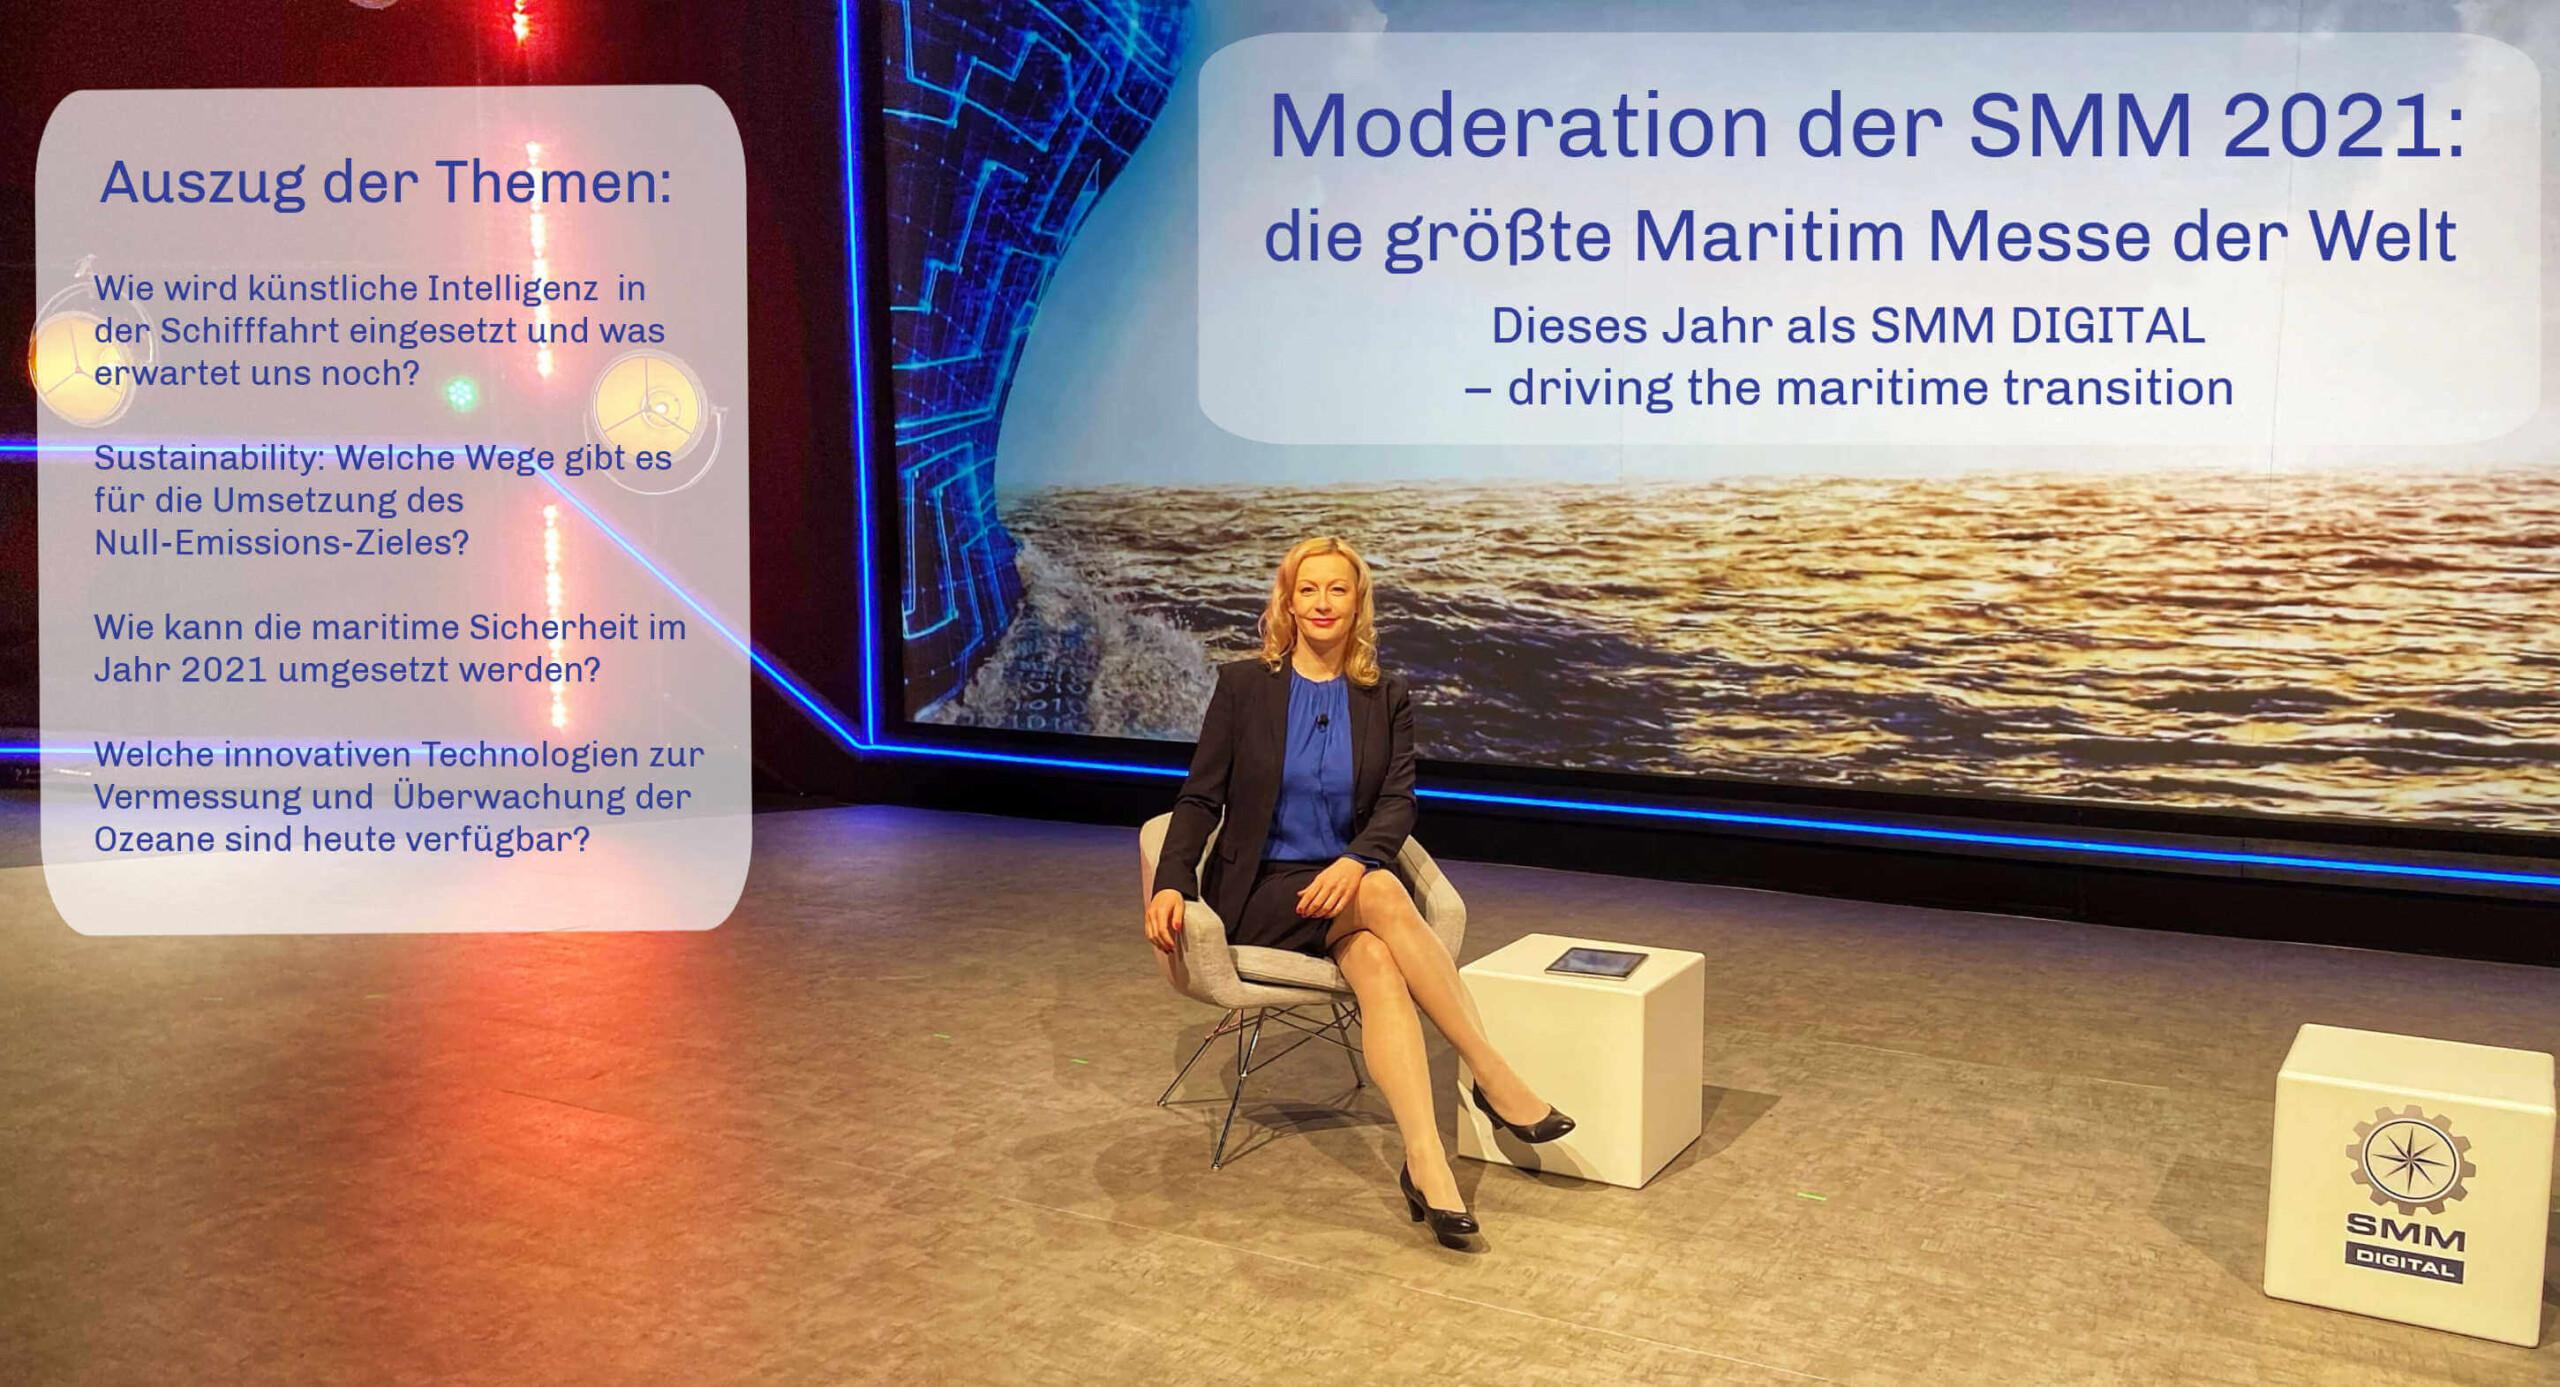 Online_Digitale_Messe_Moderatorin_Carmen_Hentschel_Hamburg_Messe_SMM_Maritime_Messe